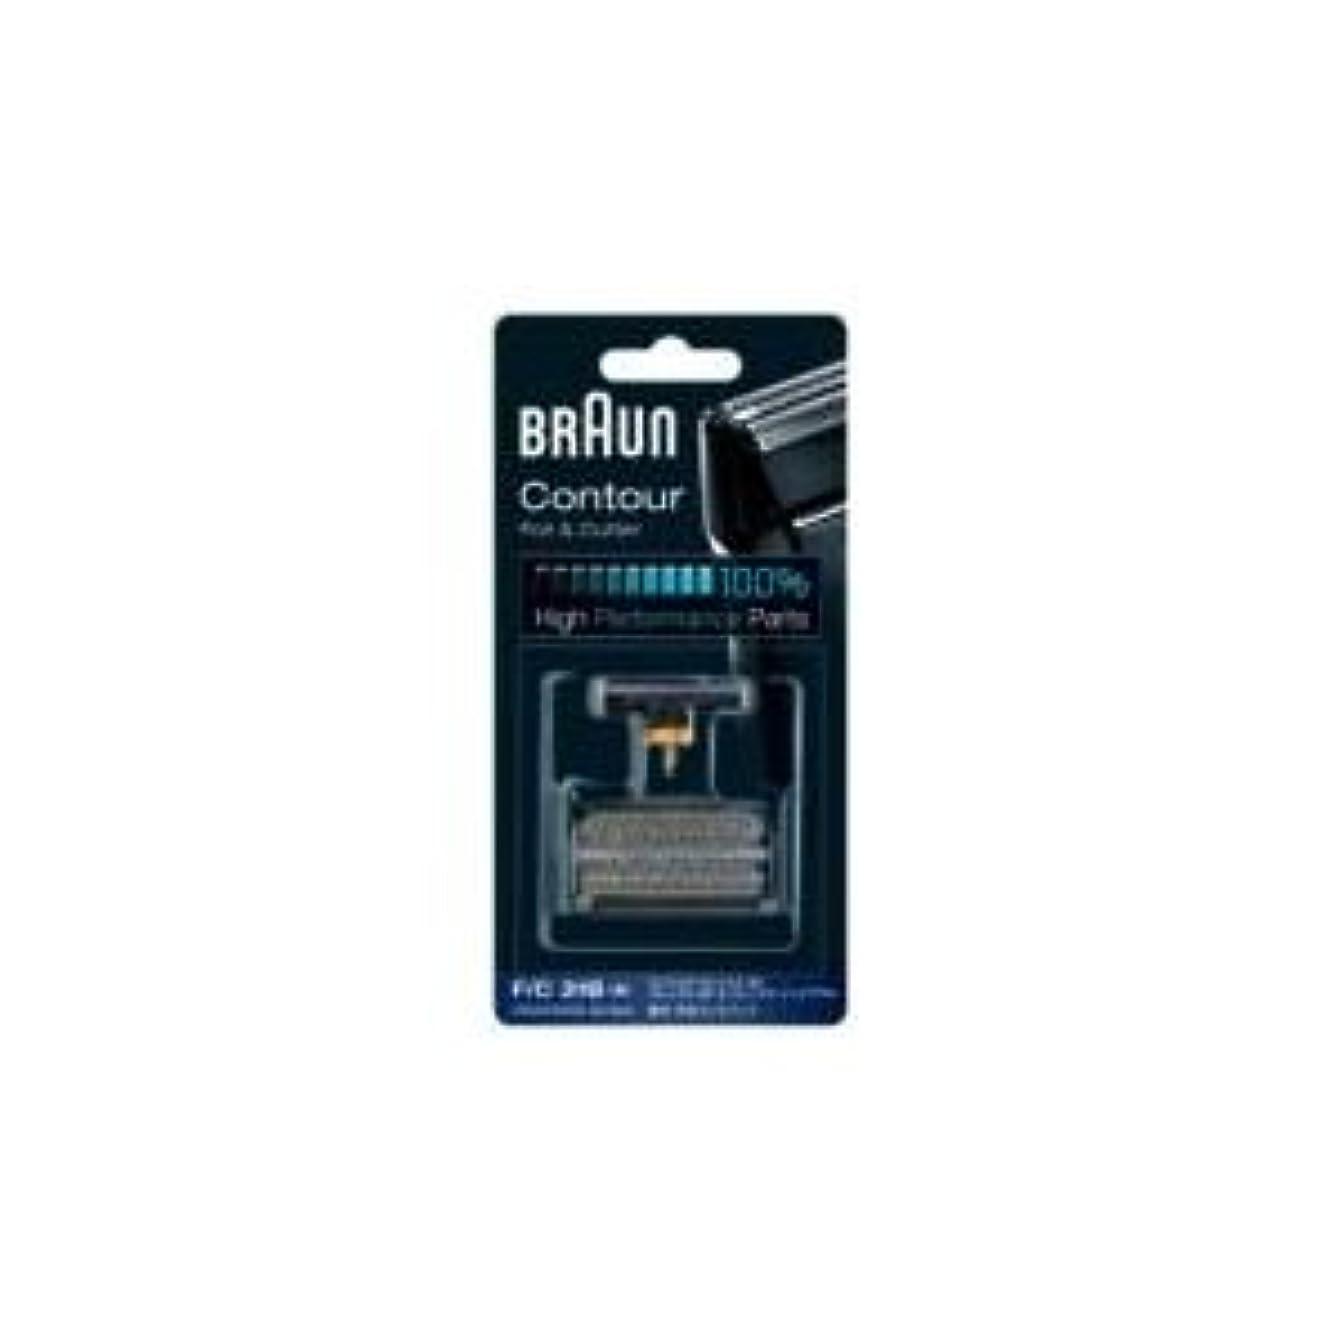 BRAUN(ブラウン) シェーバー 替刃(網刃+内刃セット) F/C31B